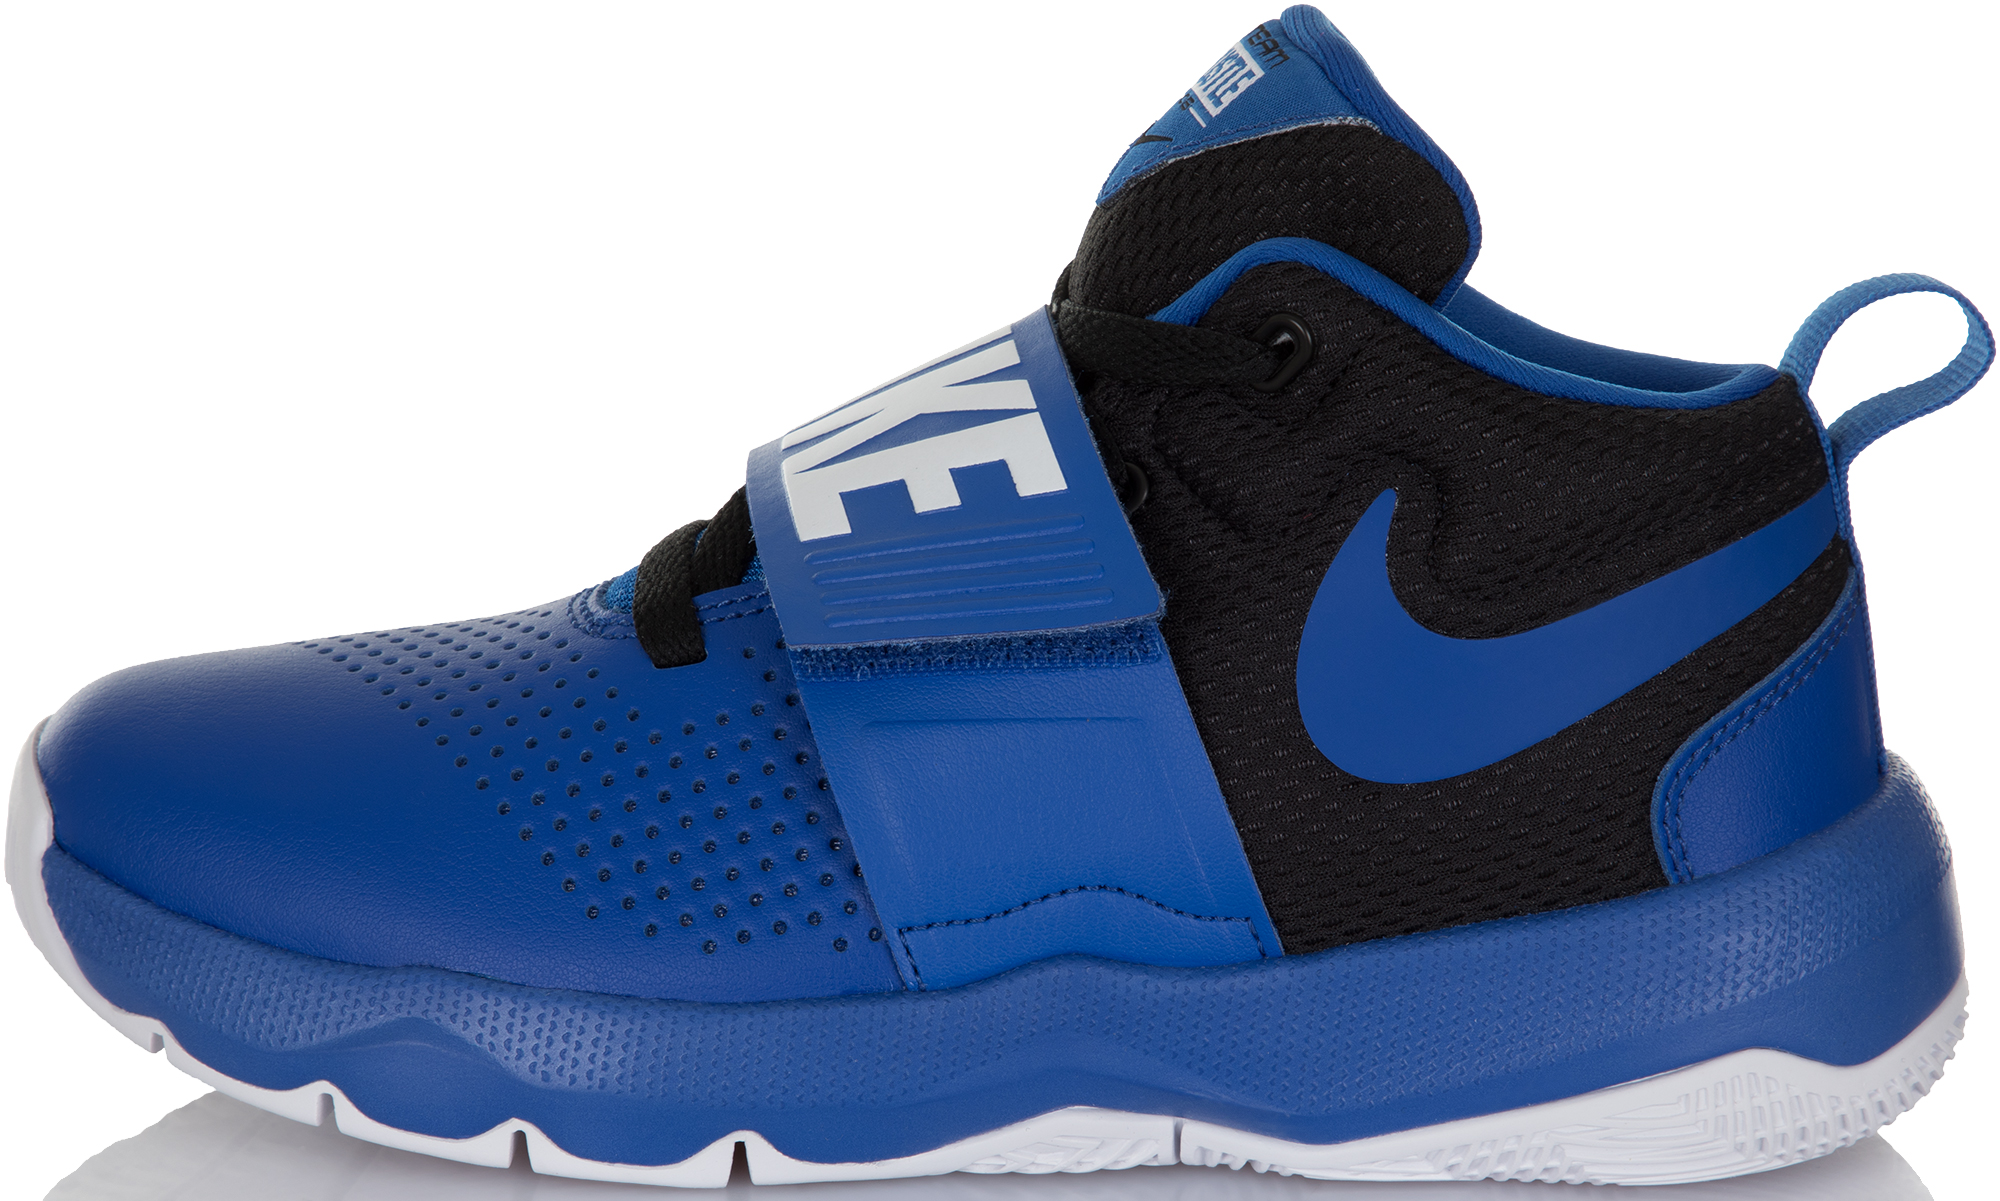 Nike Кроссовки для мальчиков Nike Team Hustle D 8 (GS), размер 37 цены онлайн